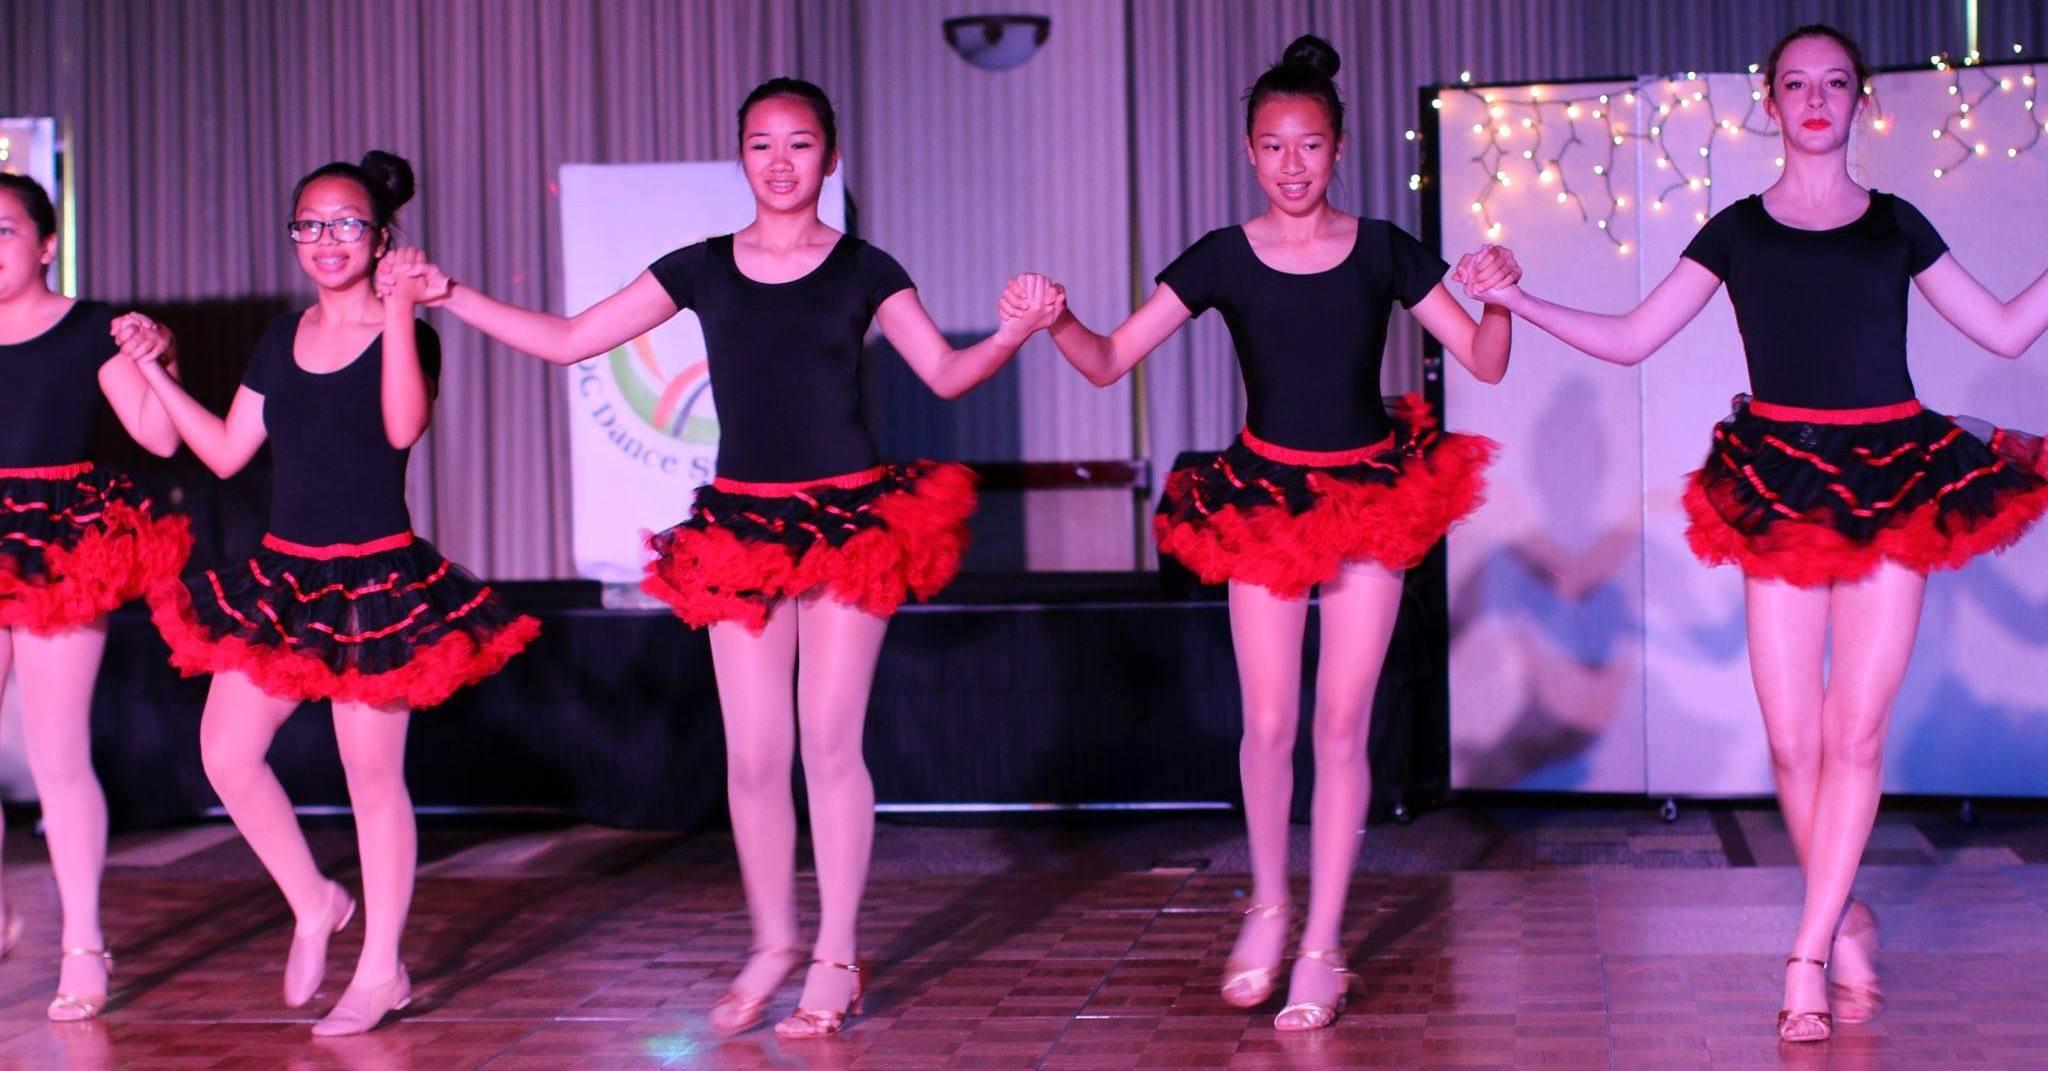 salsa dance lessons classes for kids